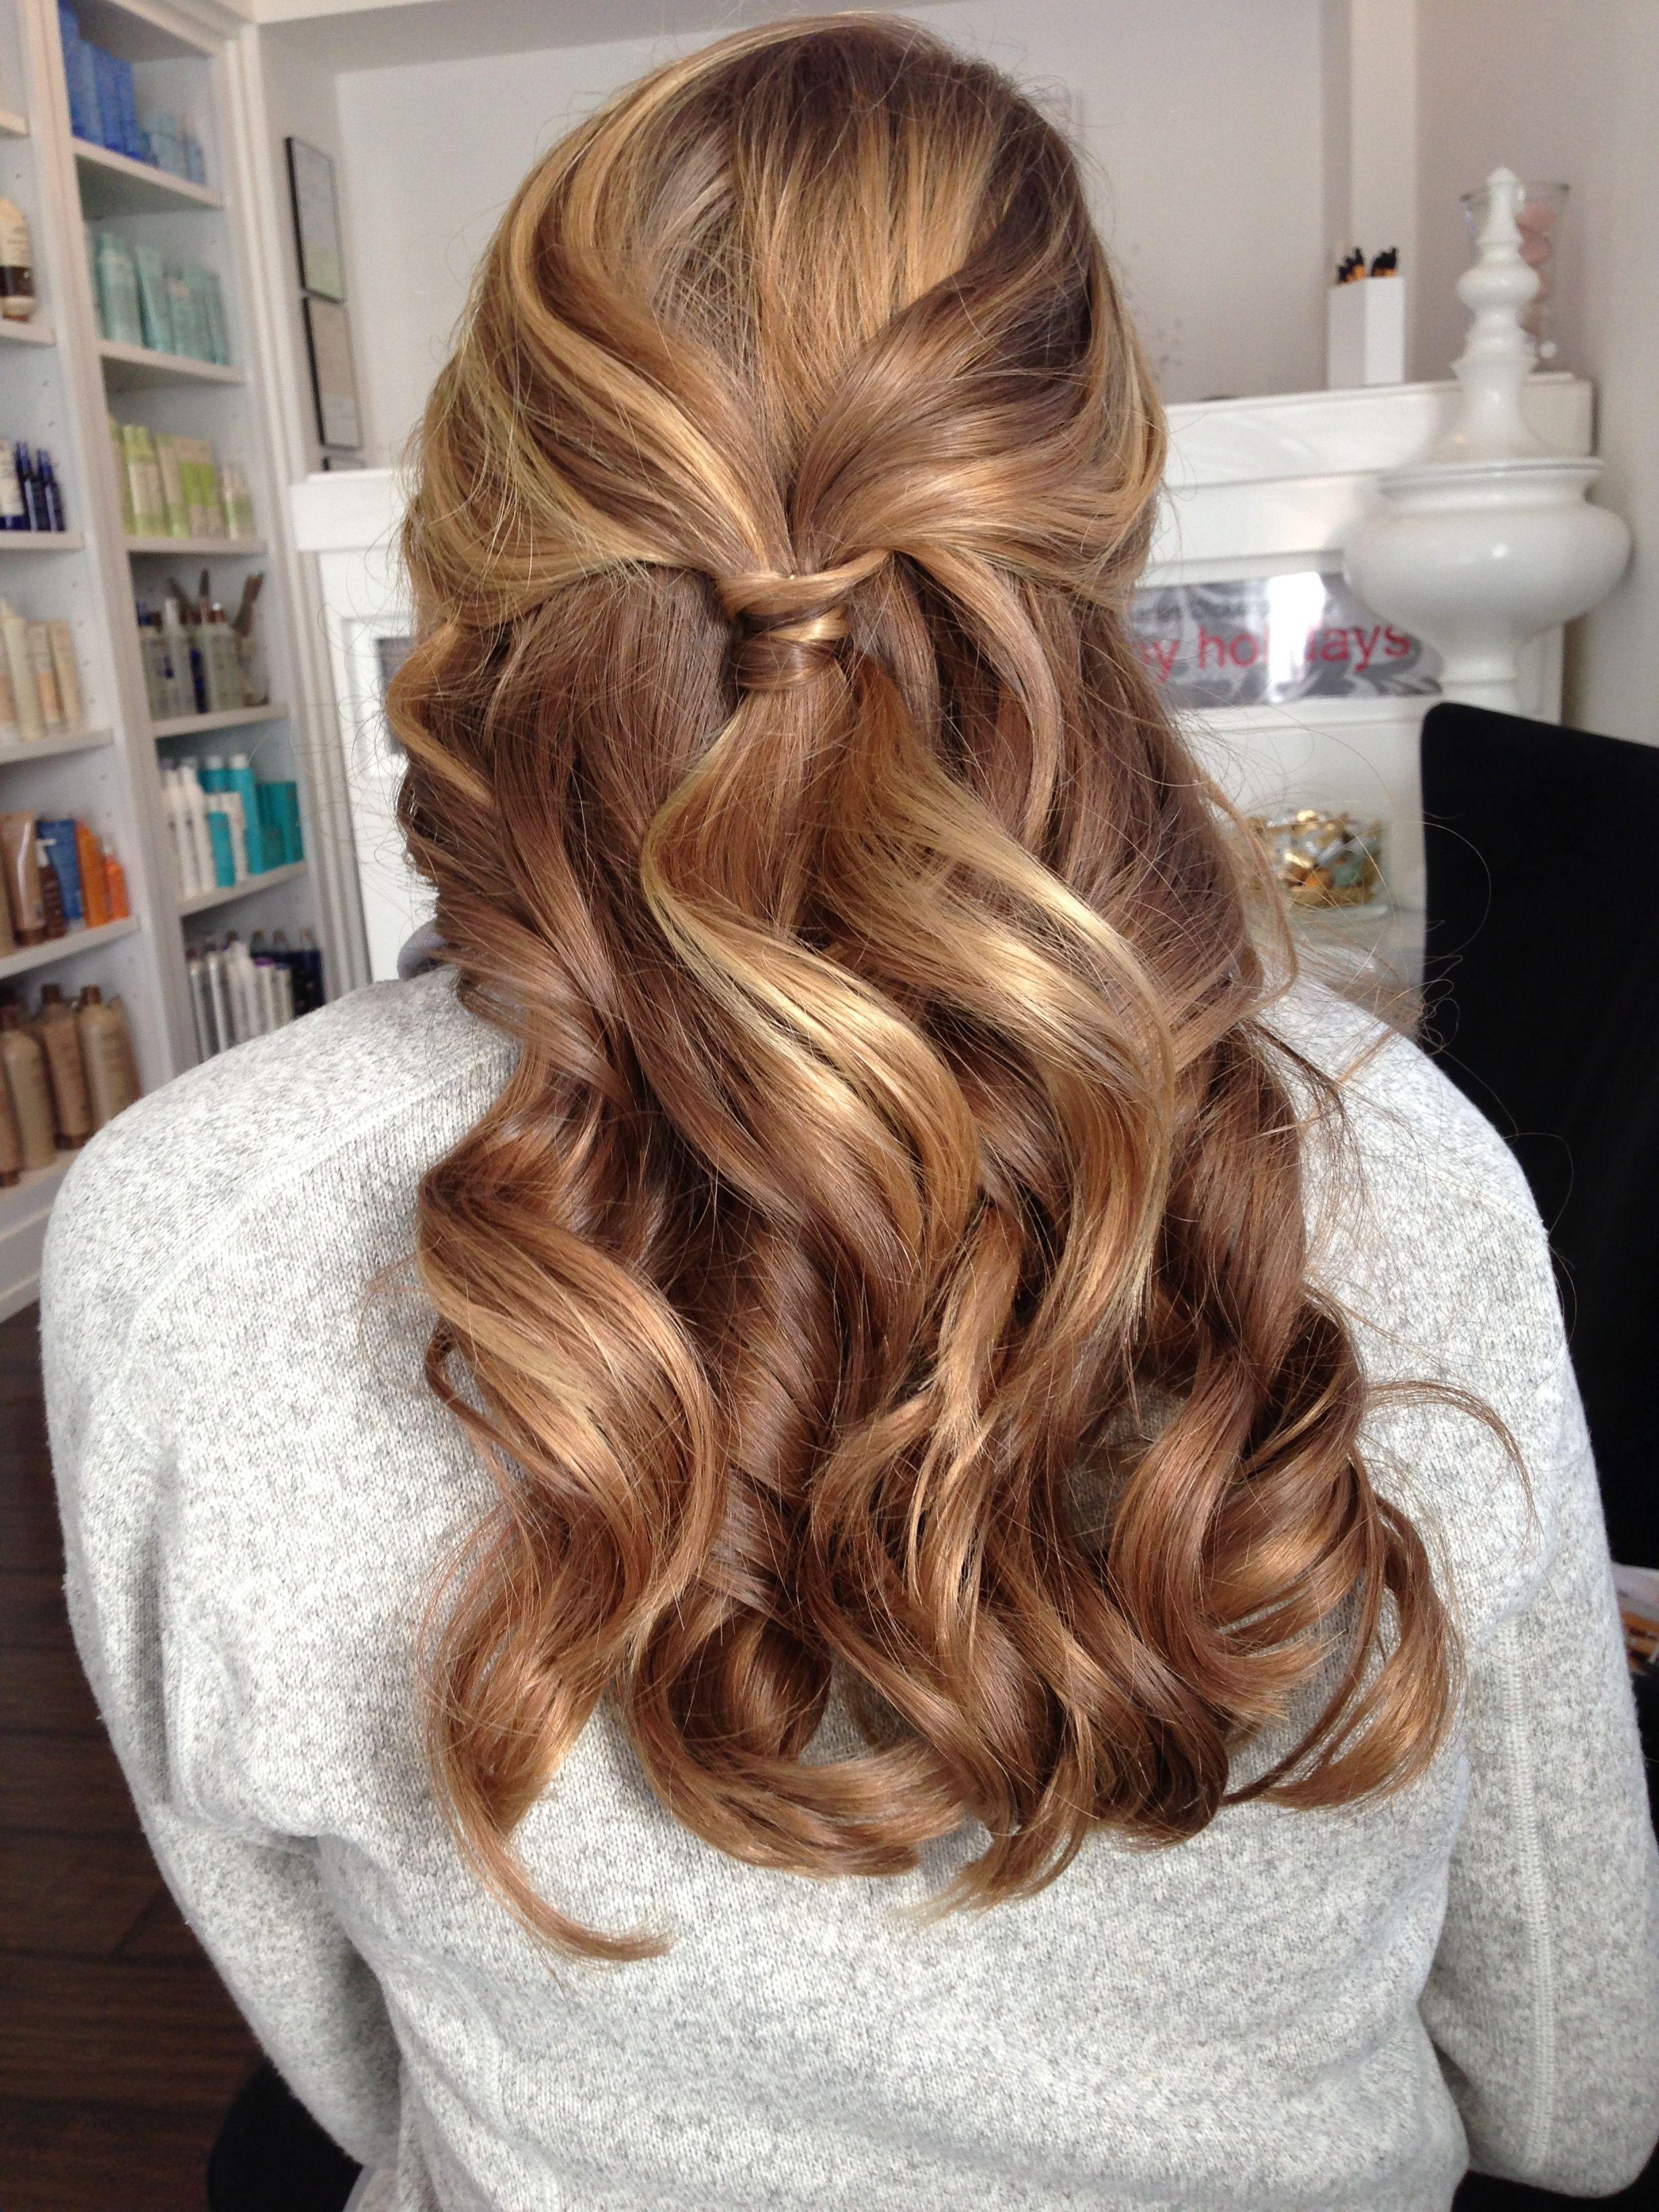 pinbaroque hair design on half up half down  hair